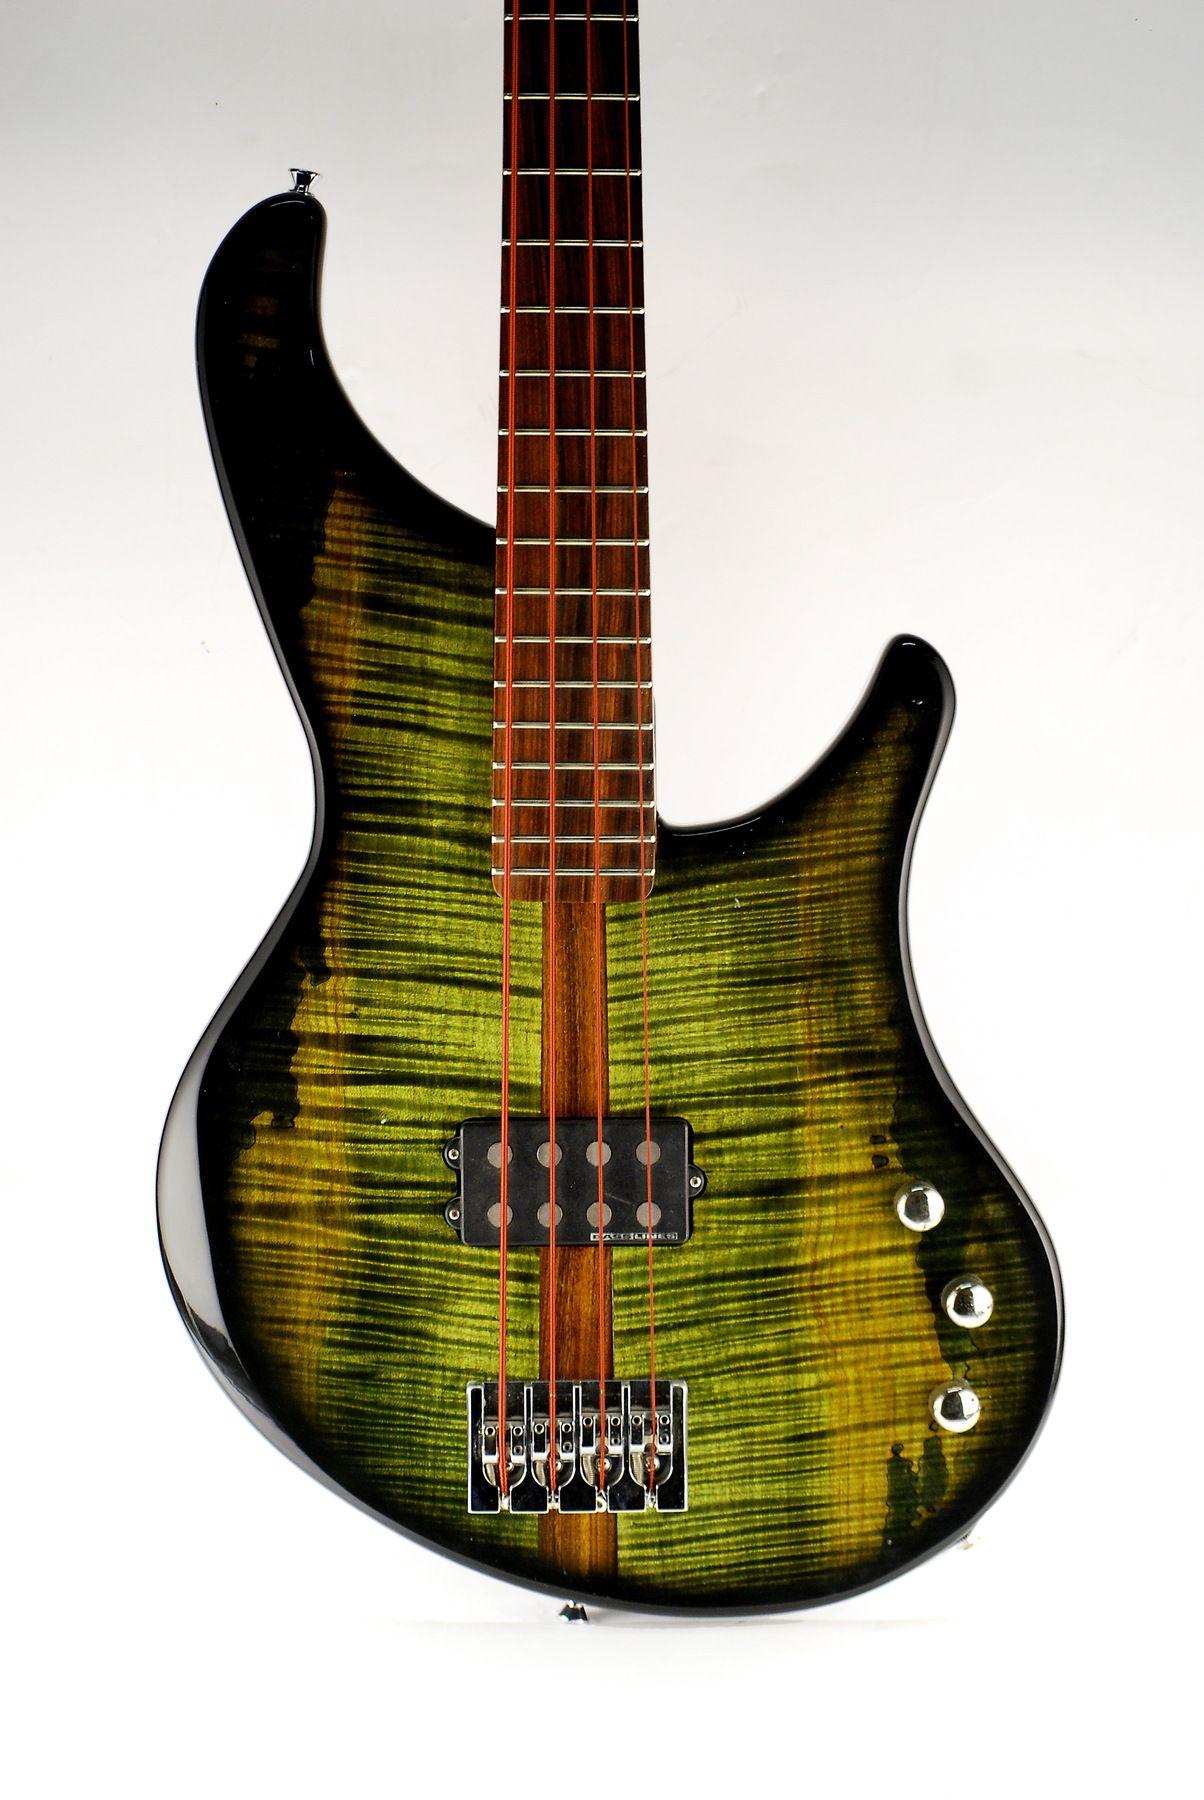 1995 Modulus VJ-4 Vintage Jazz Bass w/ John East Pre-amp and Hipshot  D-Tuner #Modulus #JazzBass | Musical Instruments & Accessories | Bass, ...